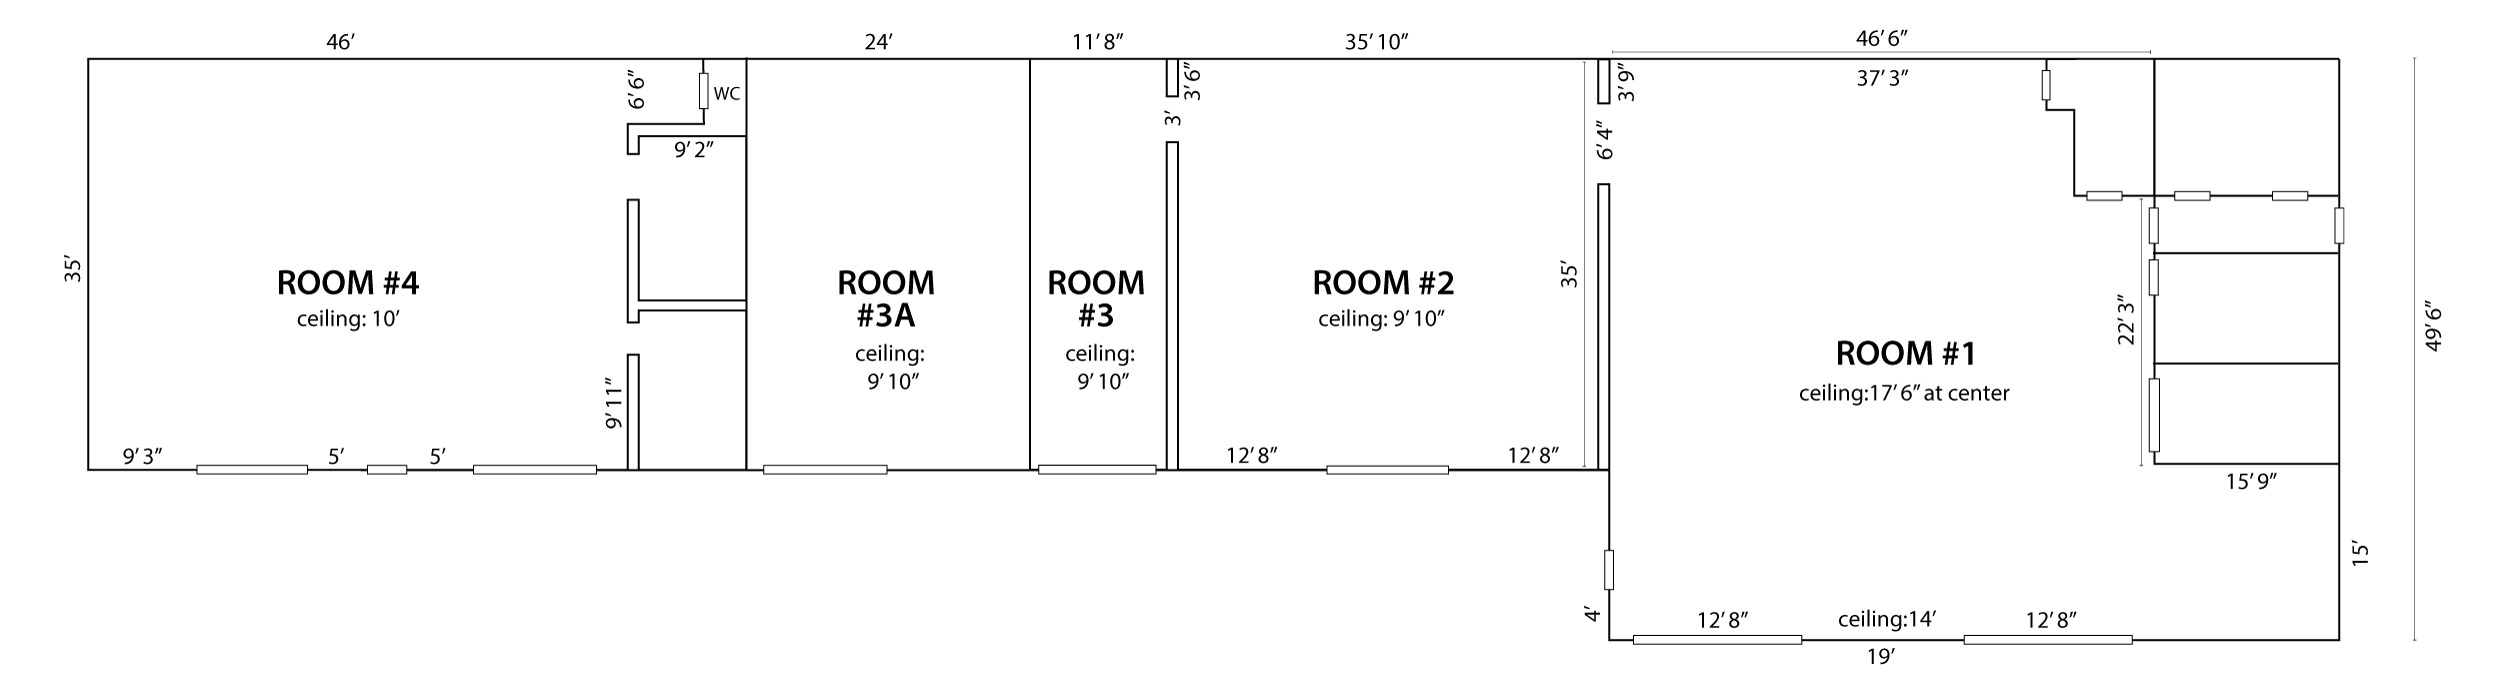 Building-1-Layout.jpg